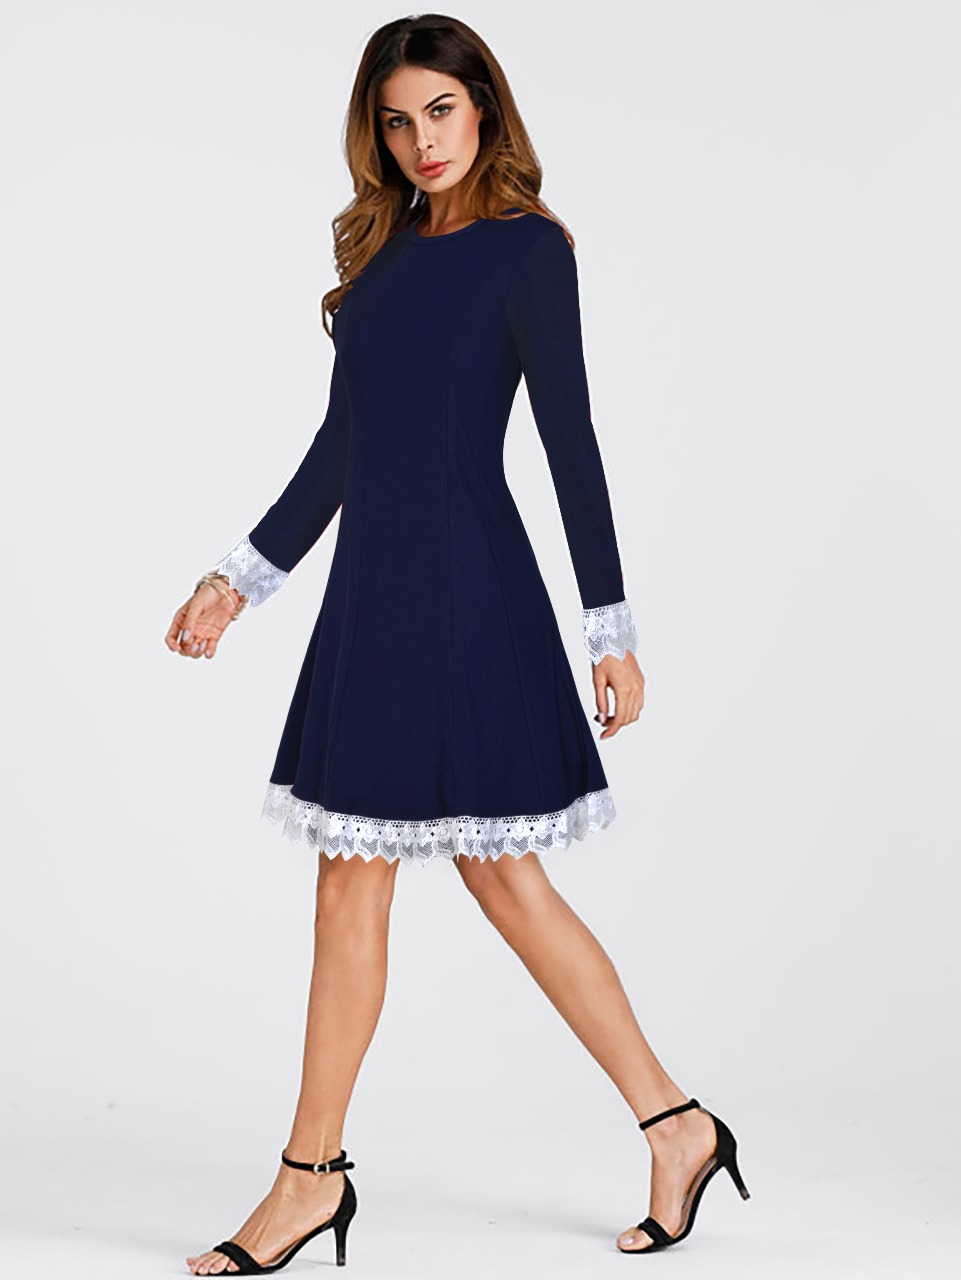 Navy Blue Lacy Slim Fit Dress